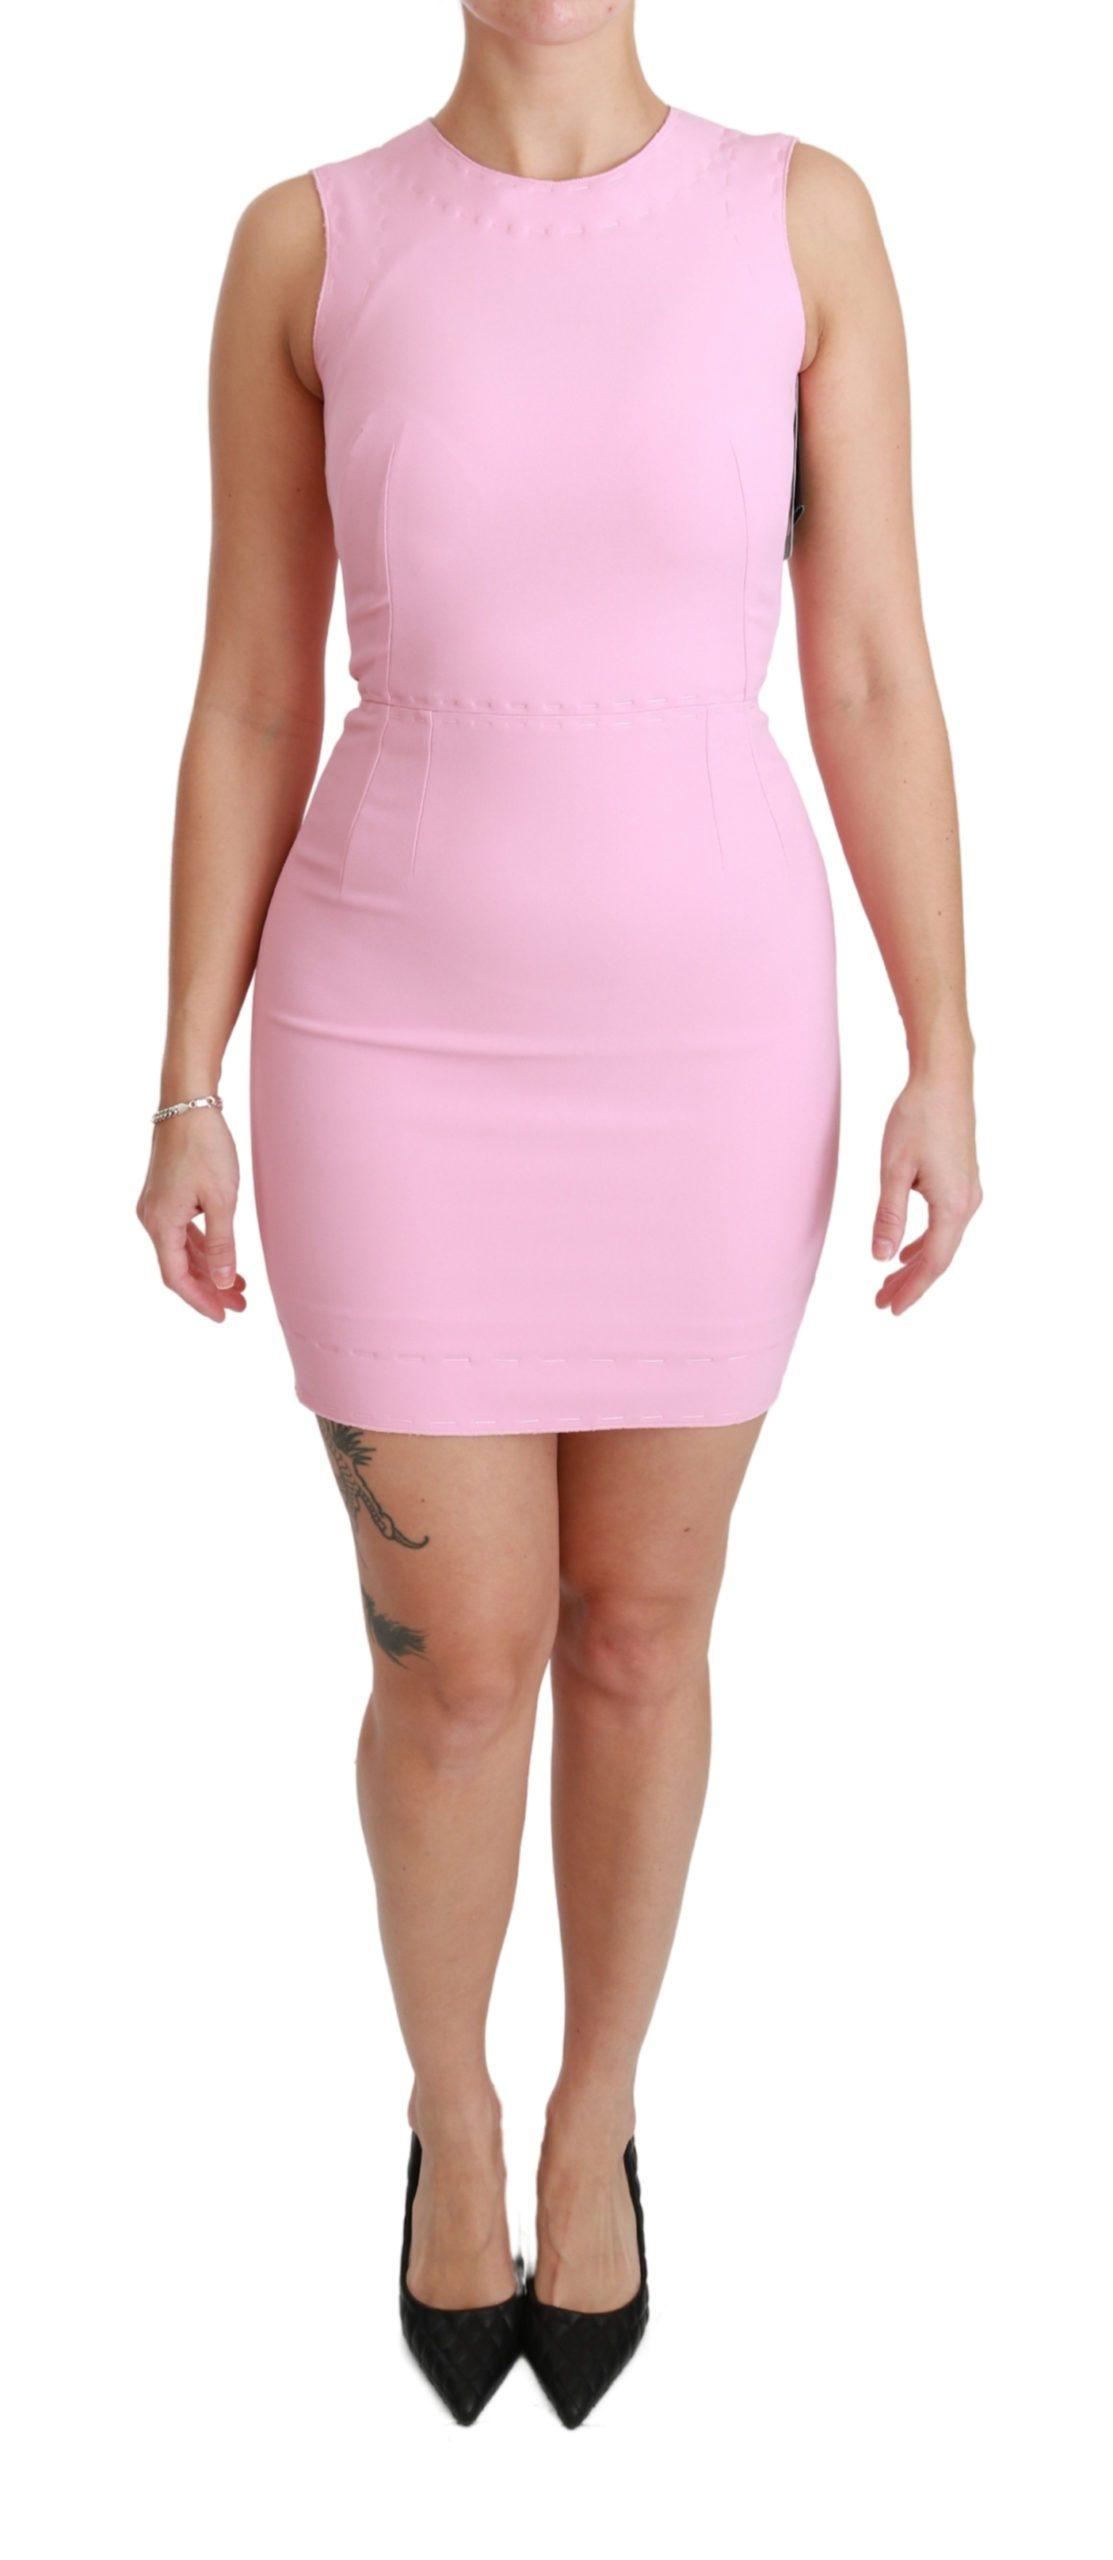 Dolce & Gabbana Women's Stretch Sheath Mini Dress Pink DR2463 - IT36   XS